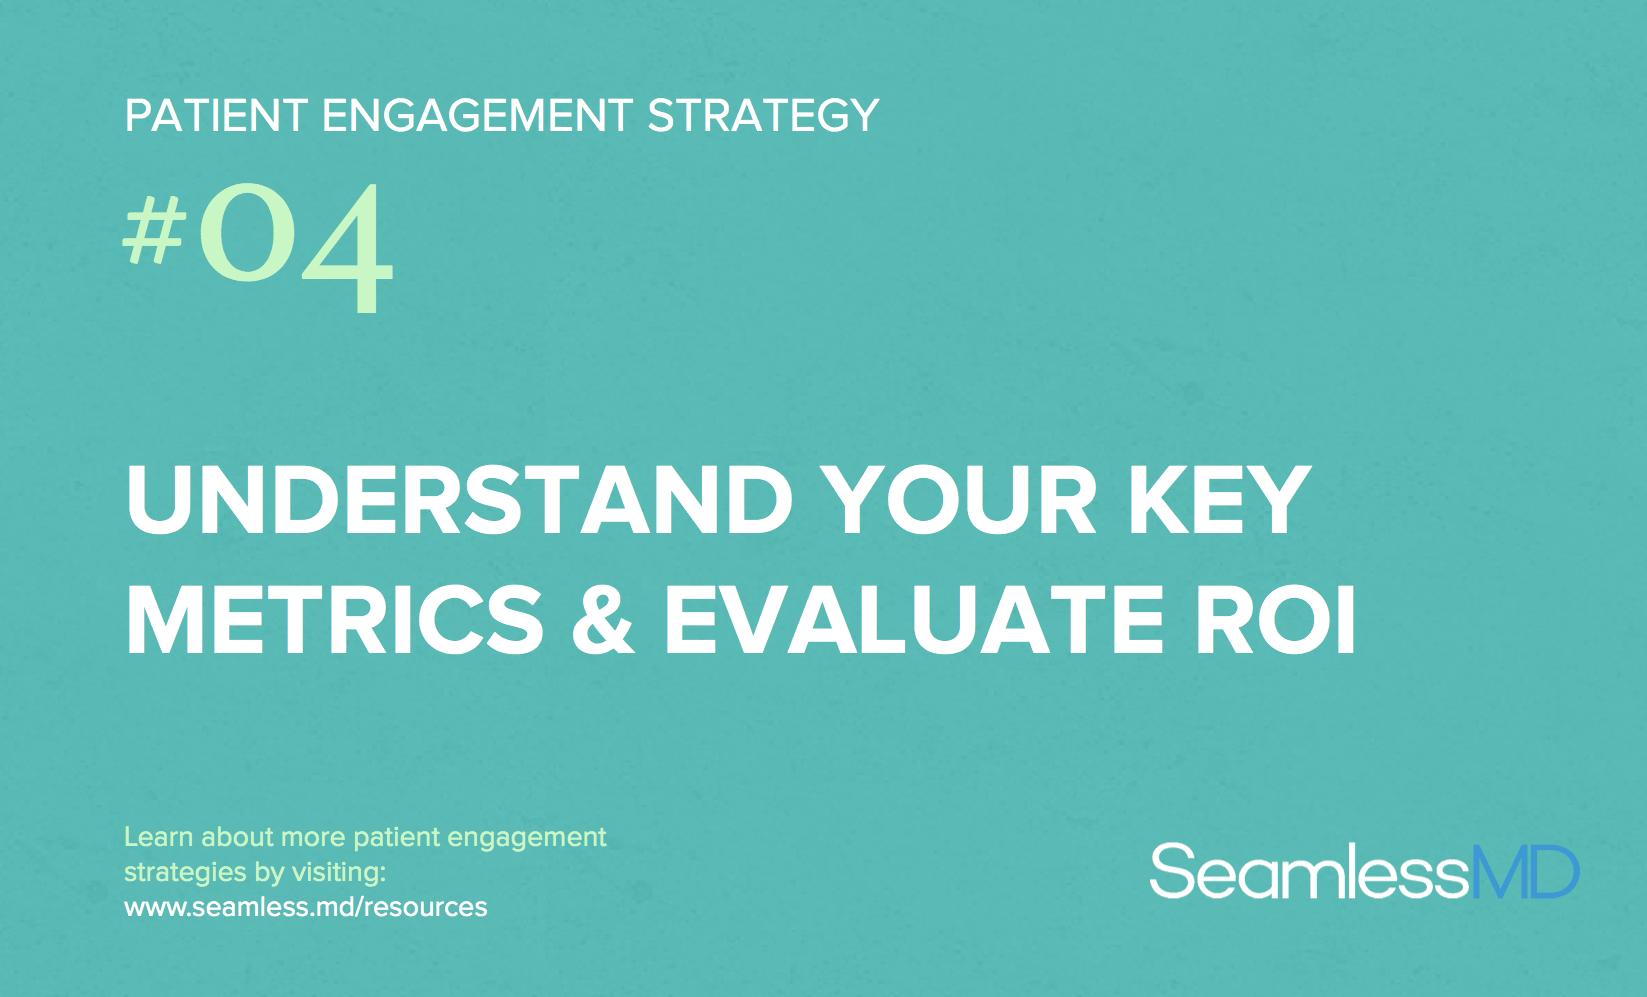 evaluate ROI for patient engagement